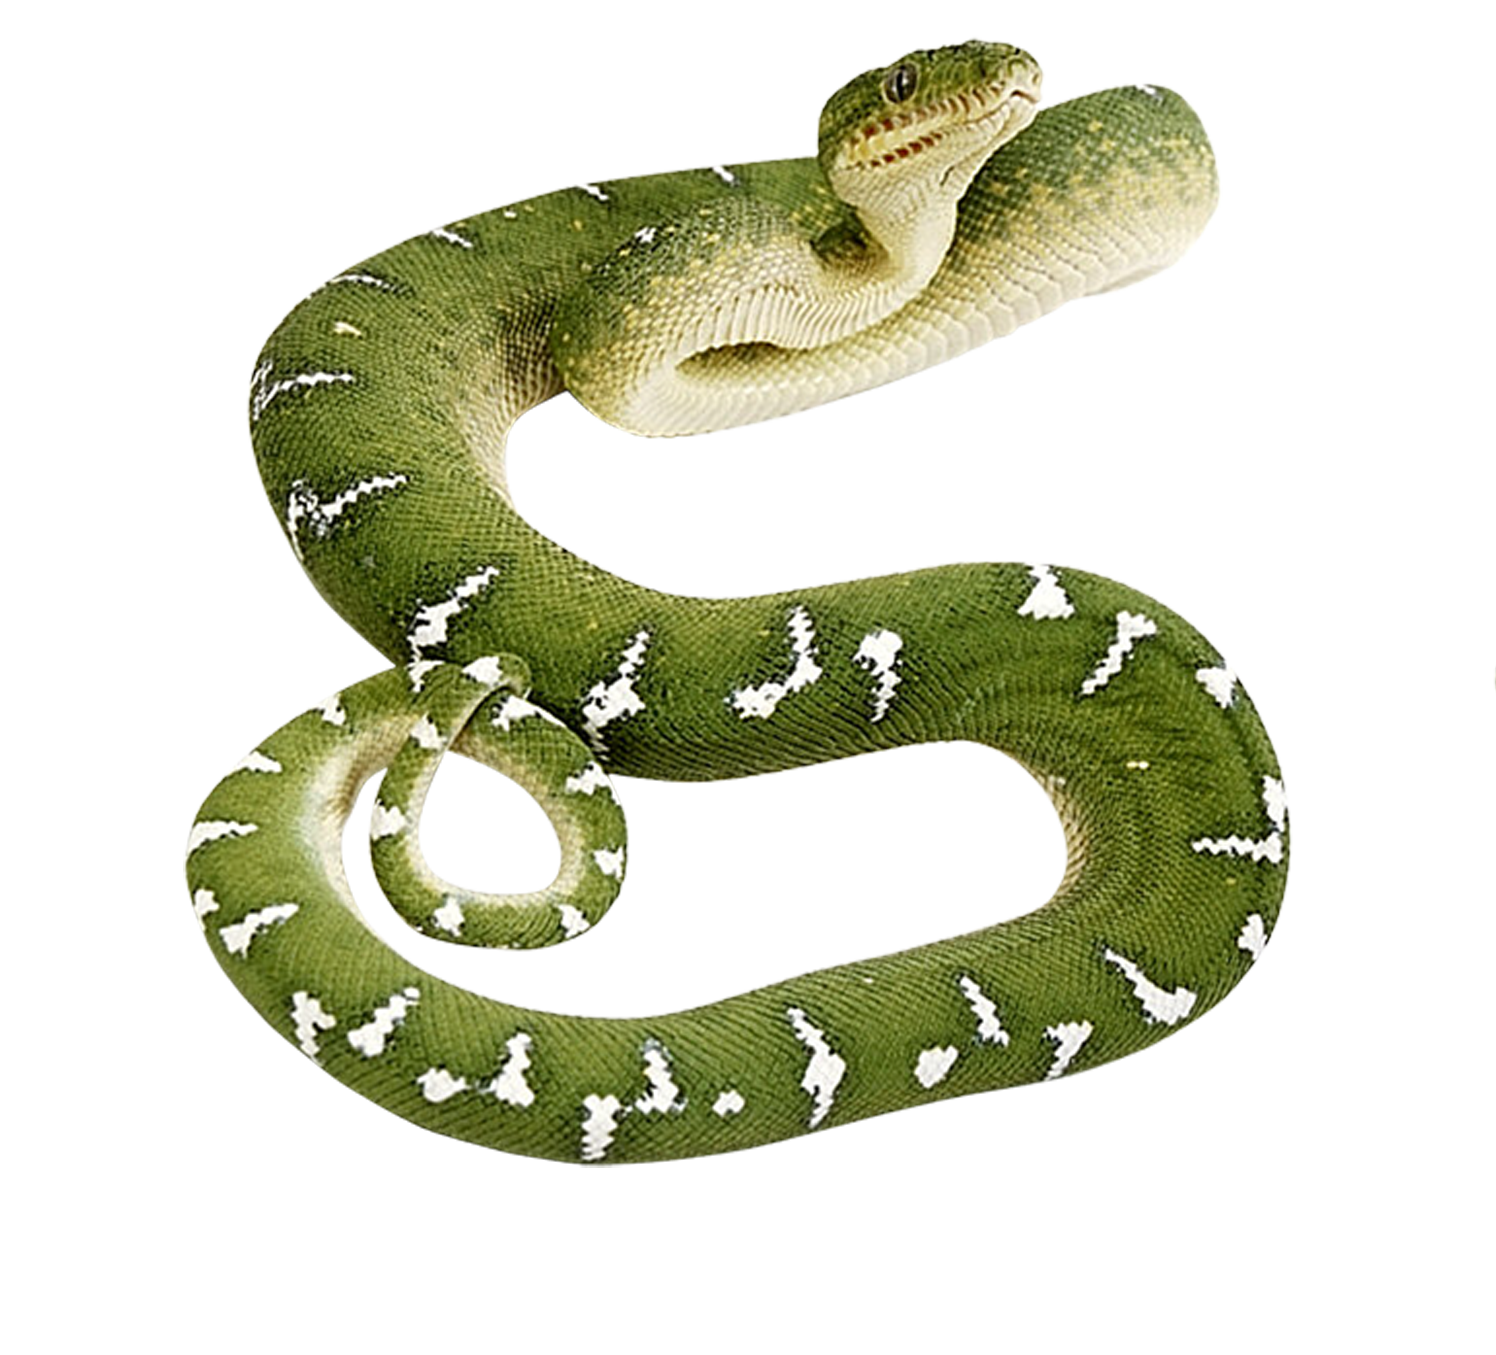 Brown tree snake clipart clipart transparent stock Green snake PNG | Animal PNG | Pinterest | Snake and Animal clipart transparent stock